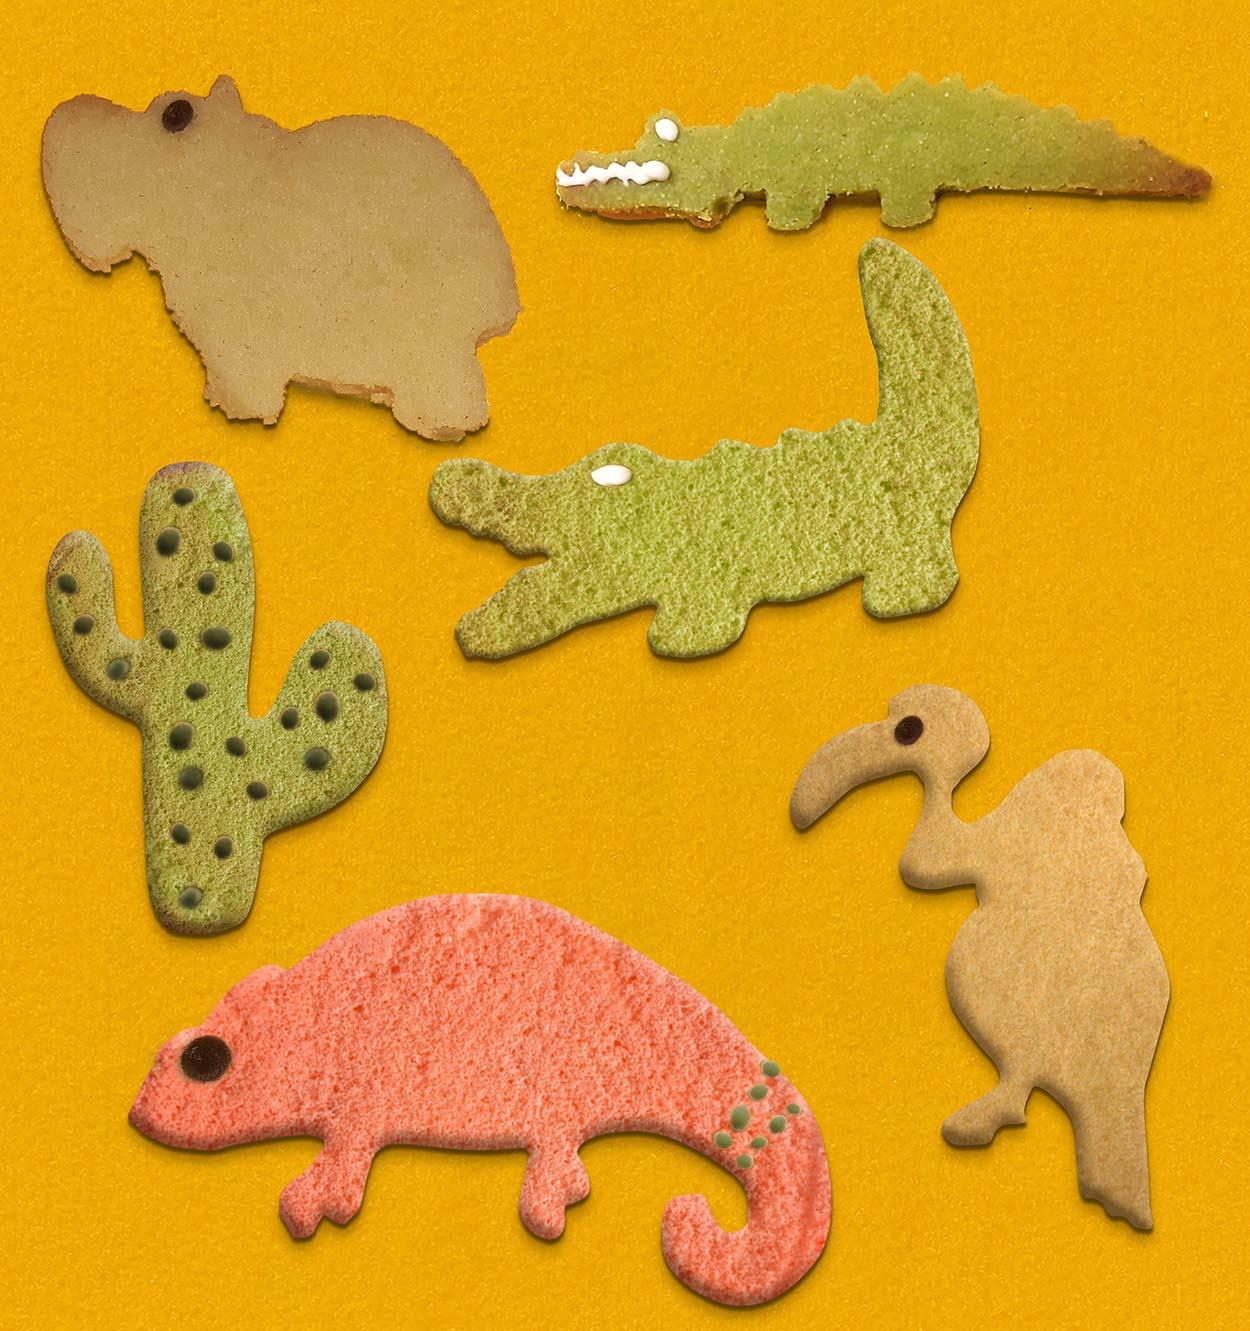 Kekse, afrikanisch, African cookies, Ausstecher Tierform. Chamäleon, Geier, Euphorbia, Krokodil, Hippo